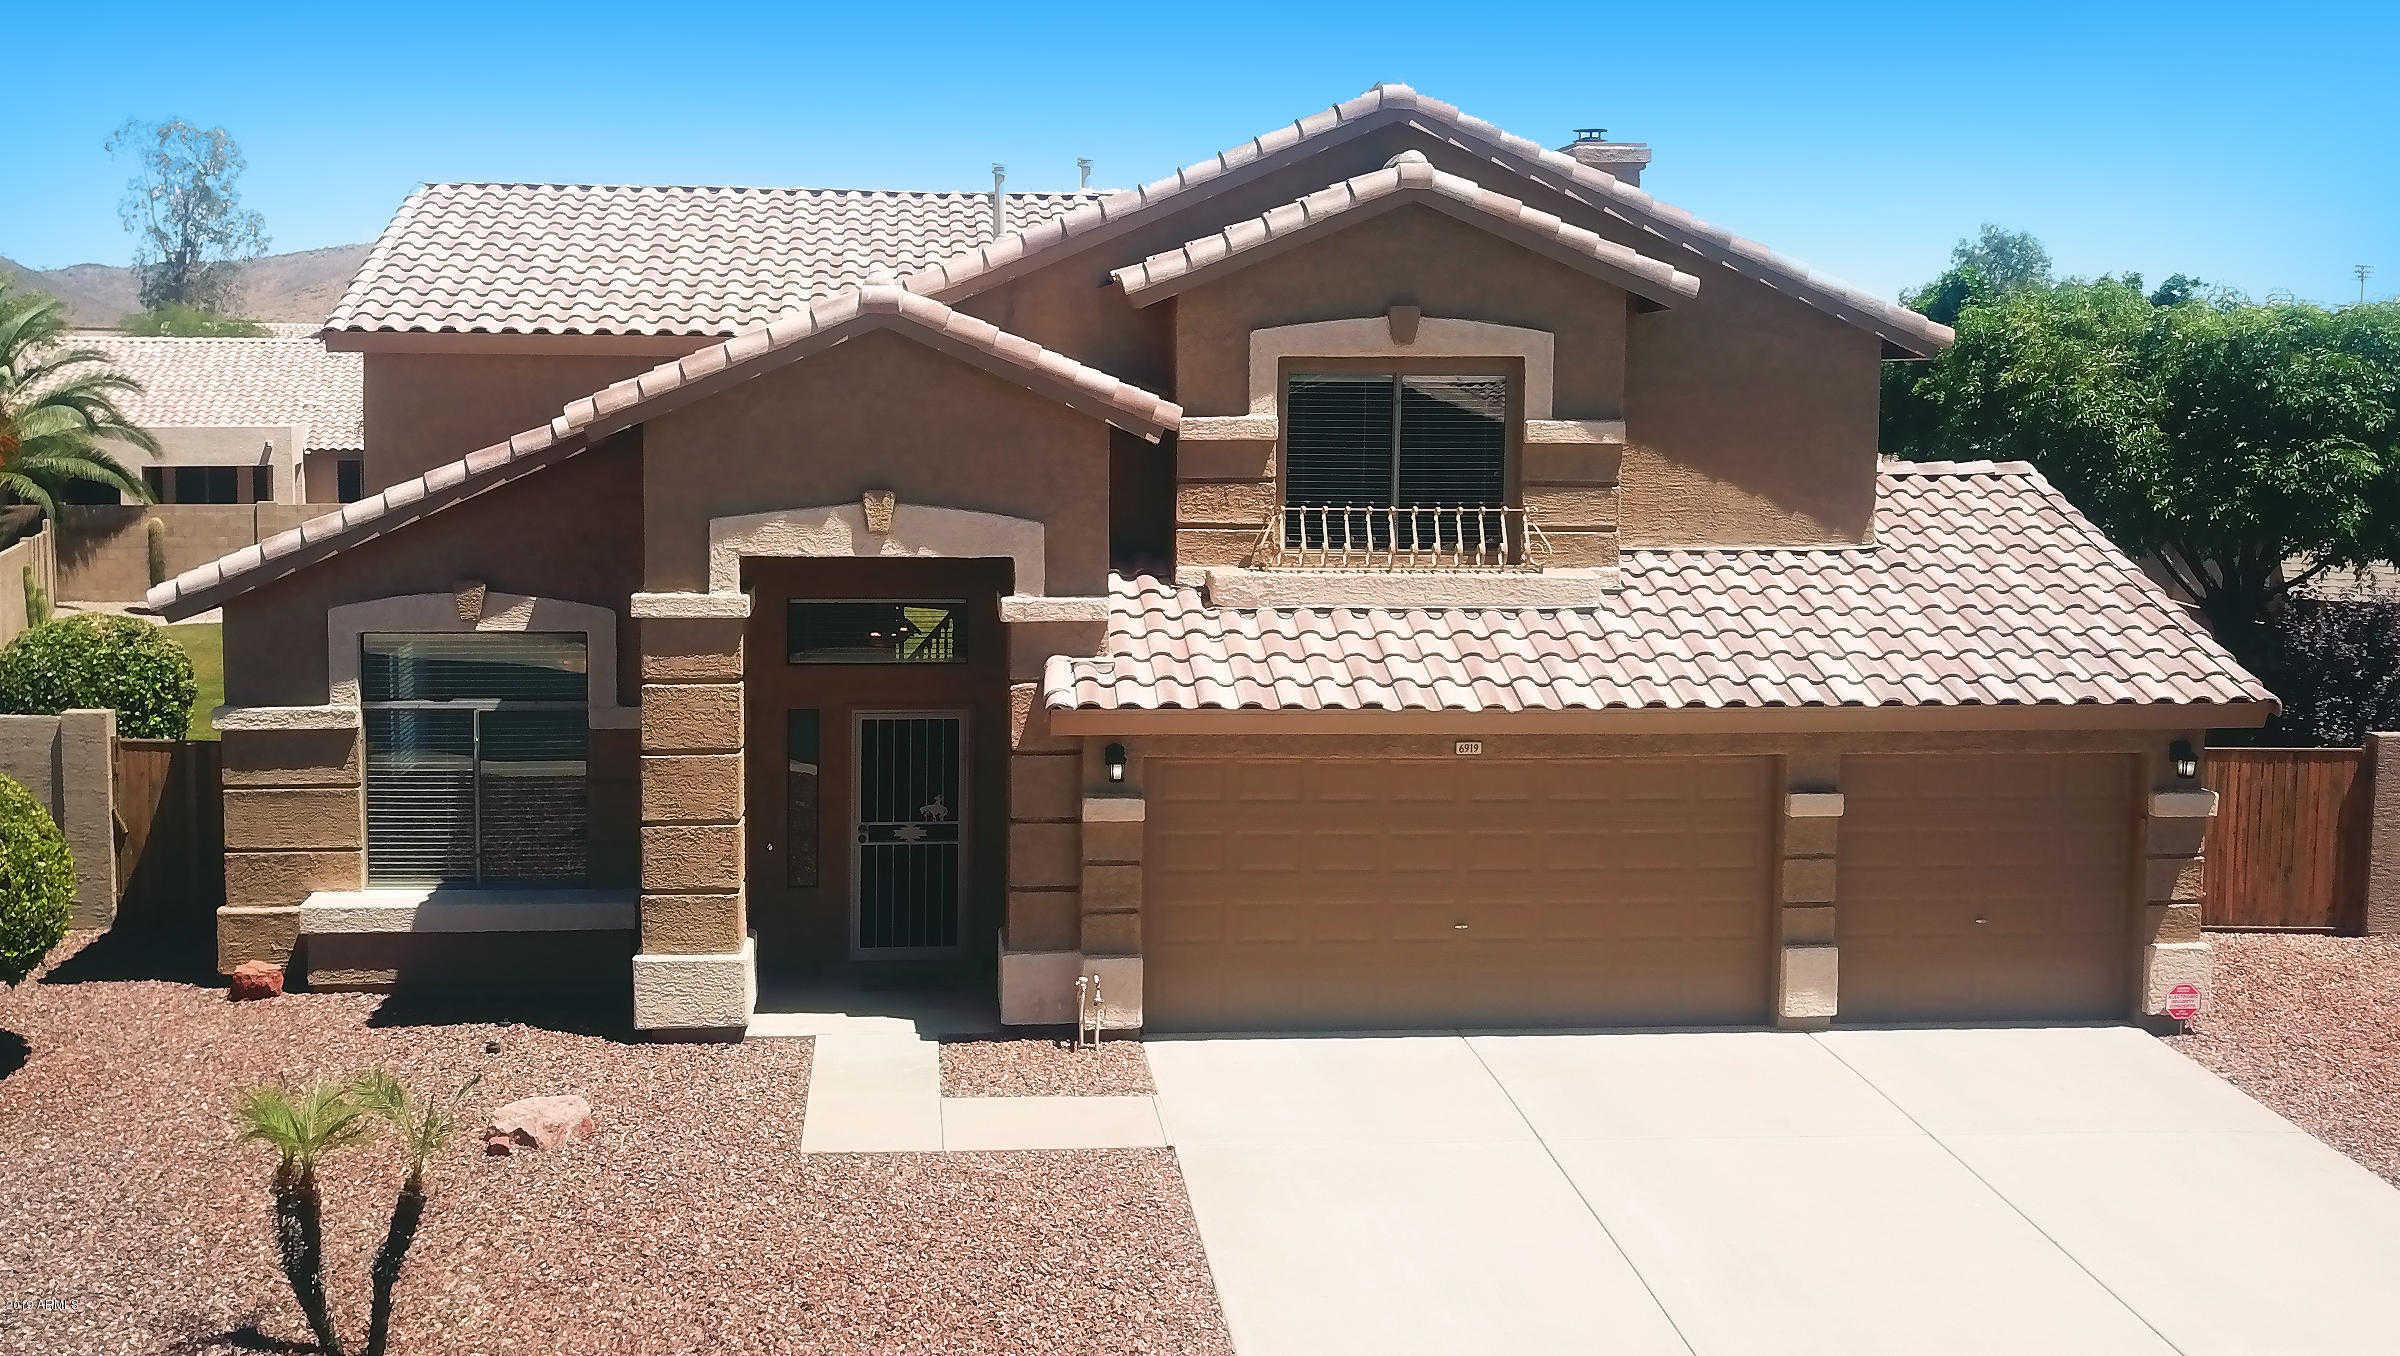 $439,900 - 3Br/3Ba - Home for Sale in Patrick Ranch, Glendale